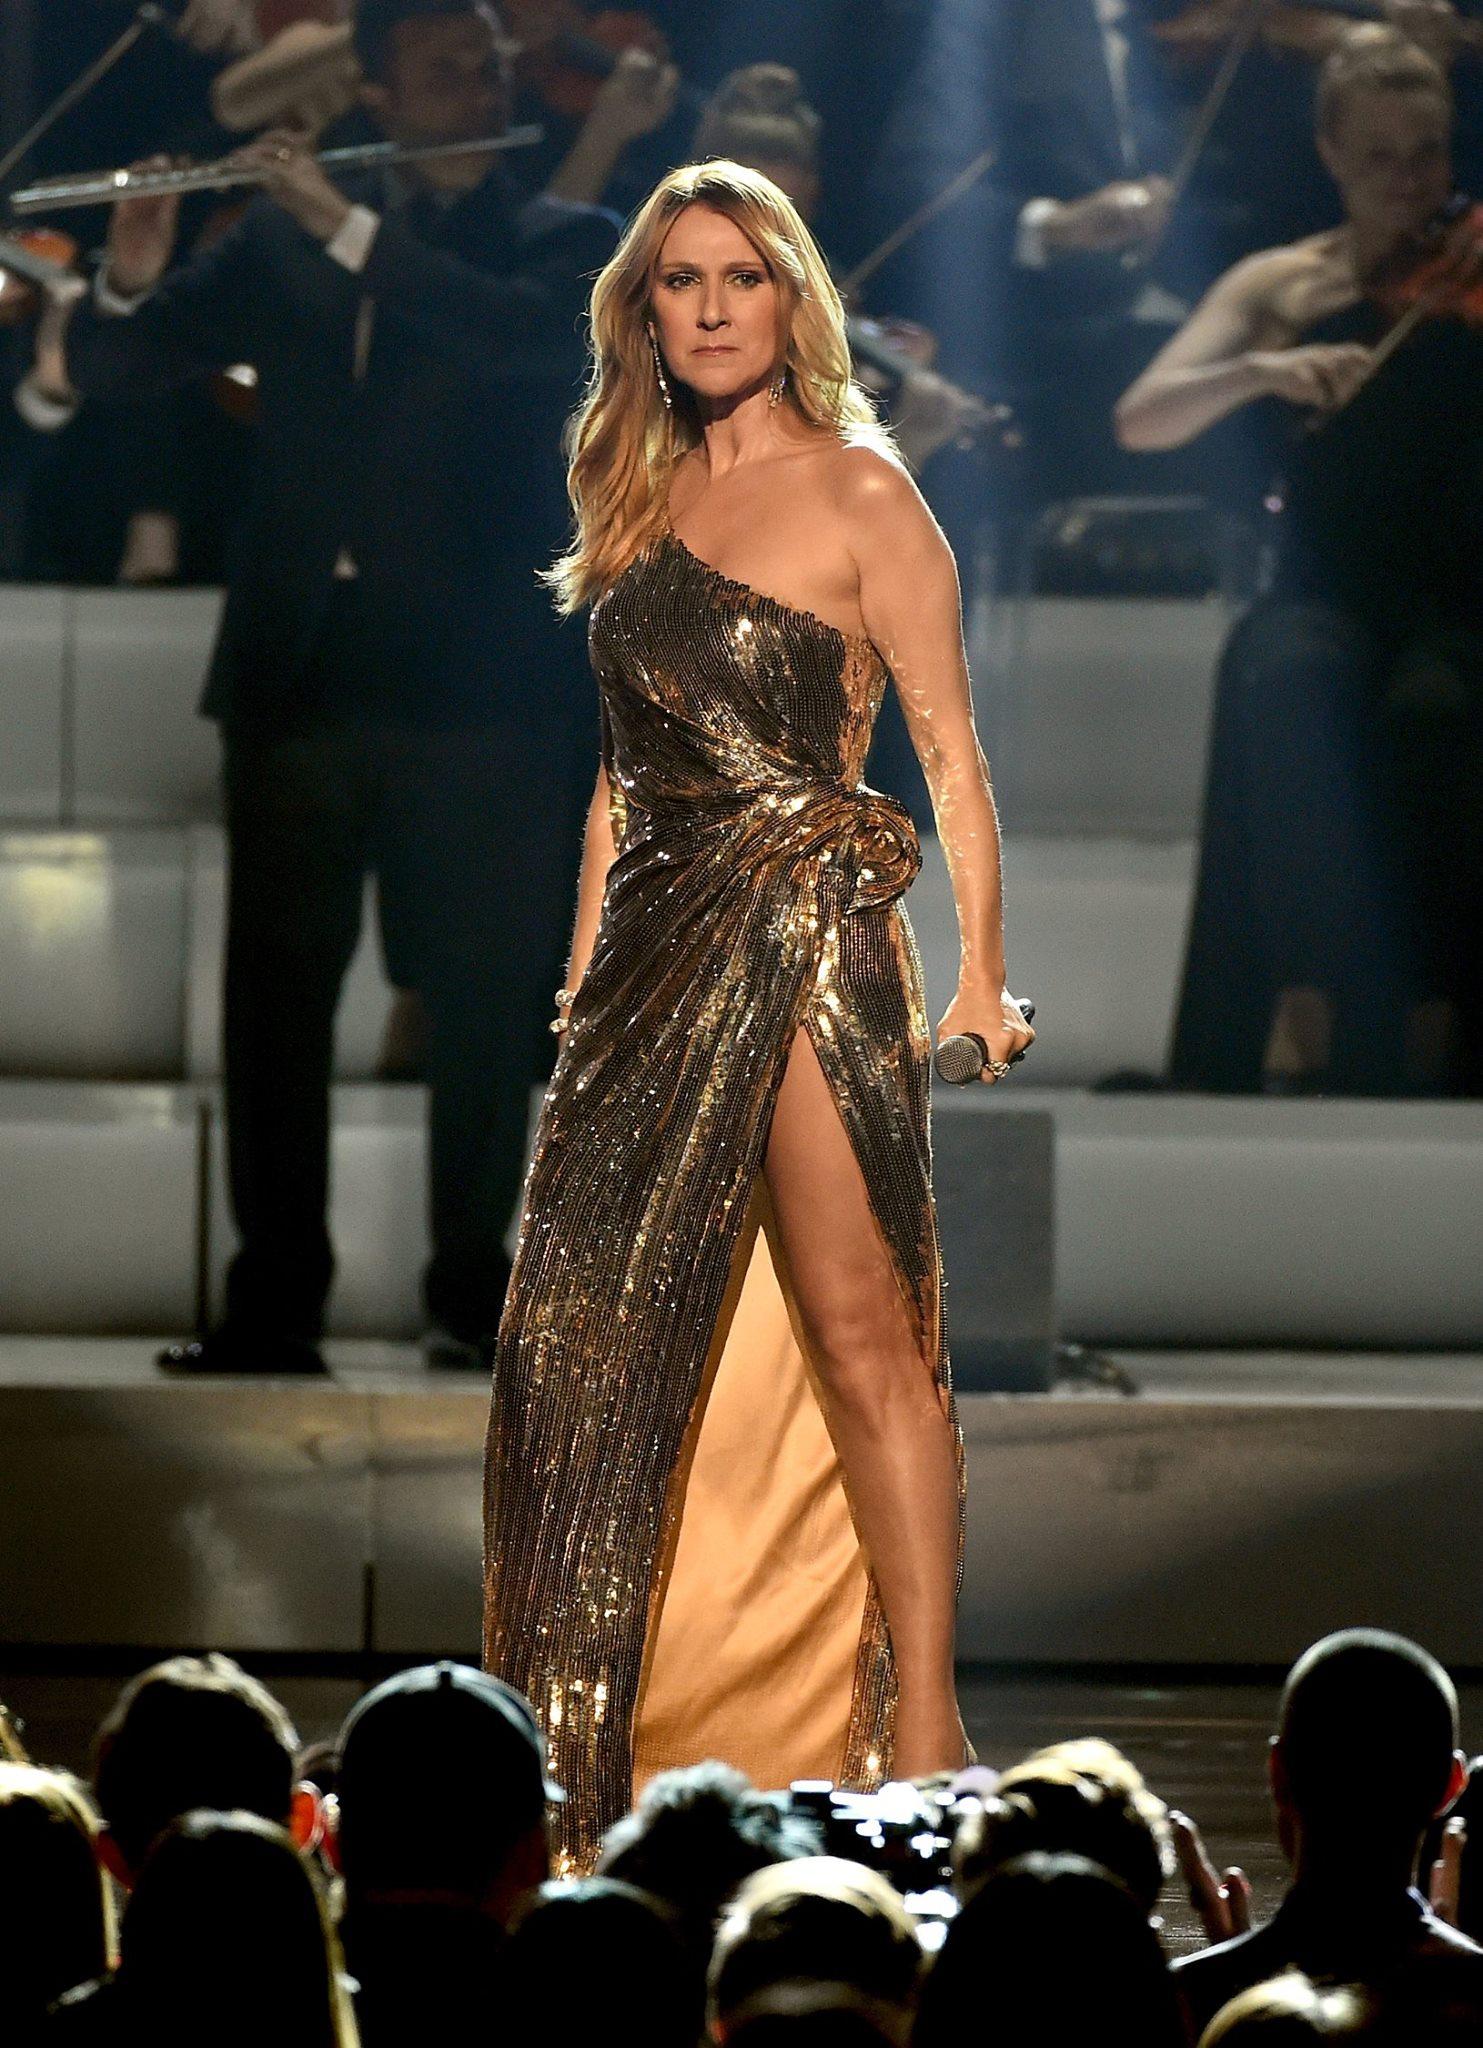 Billboard Music Awards : Céline Dion décorée